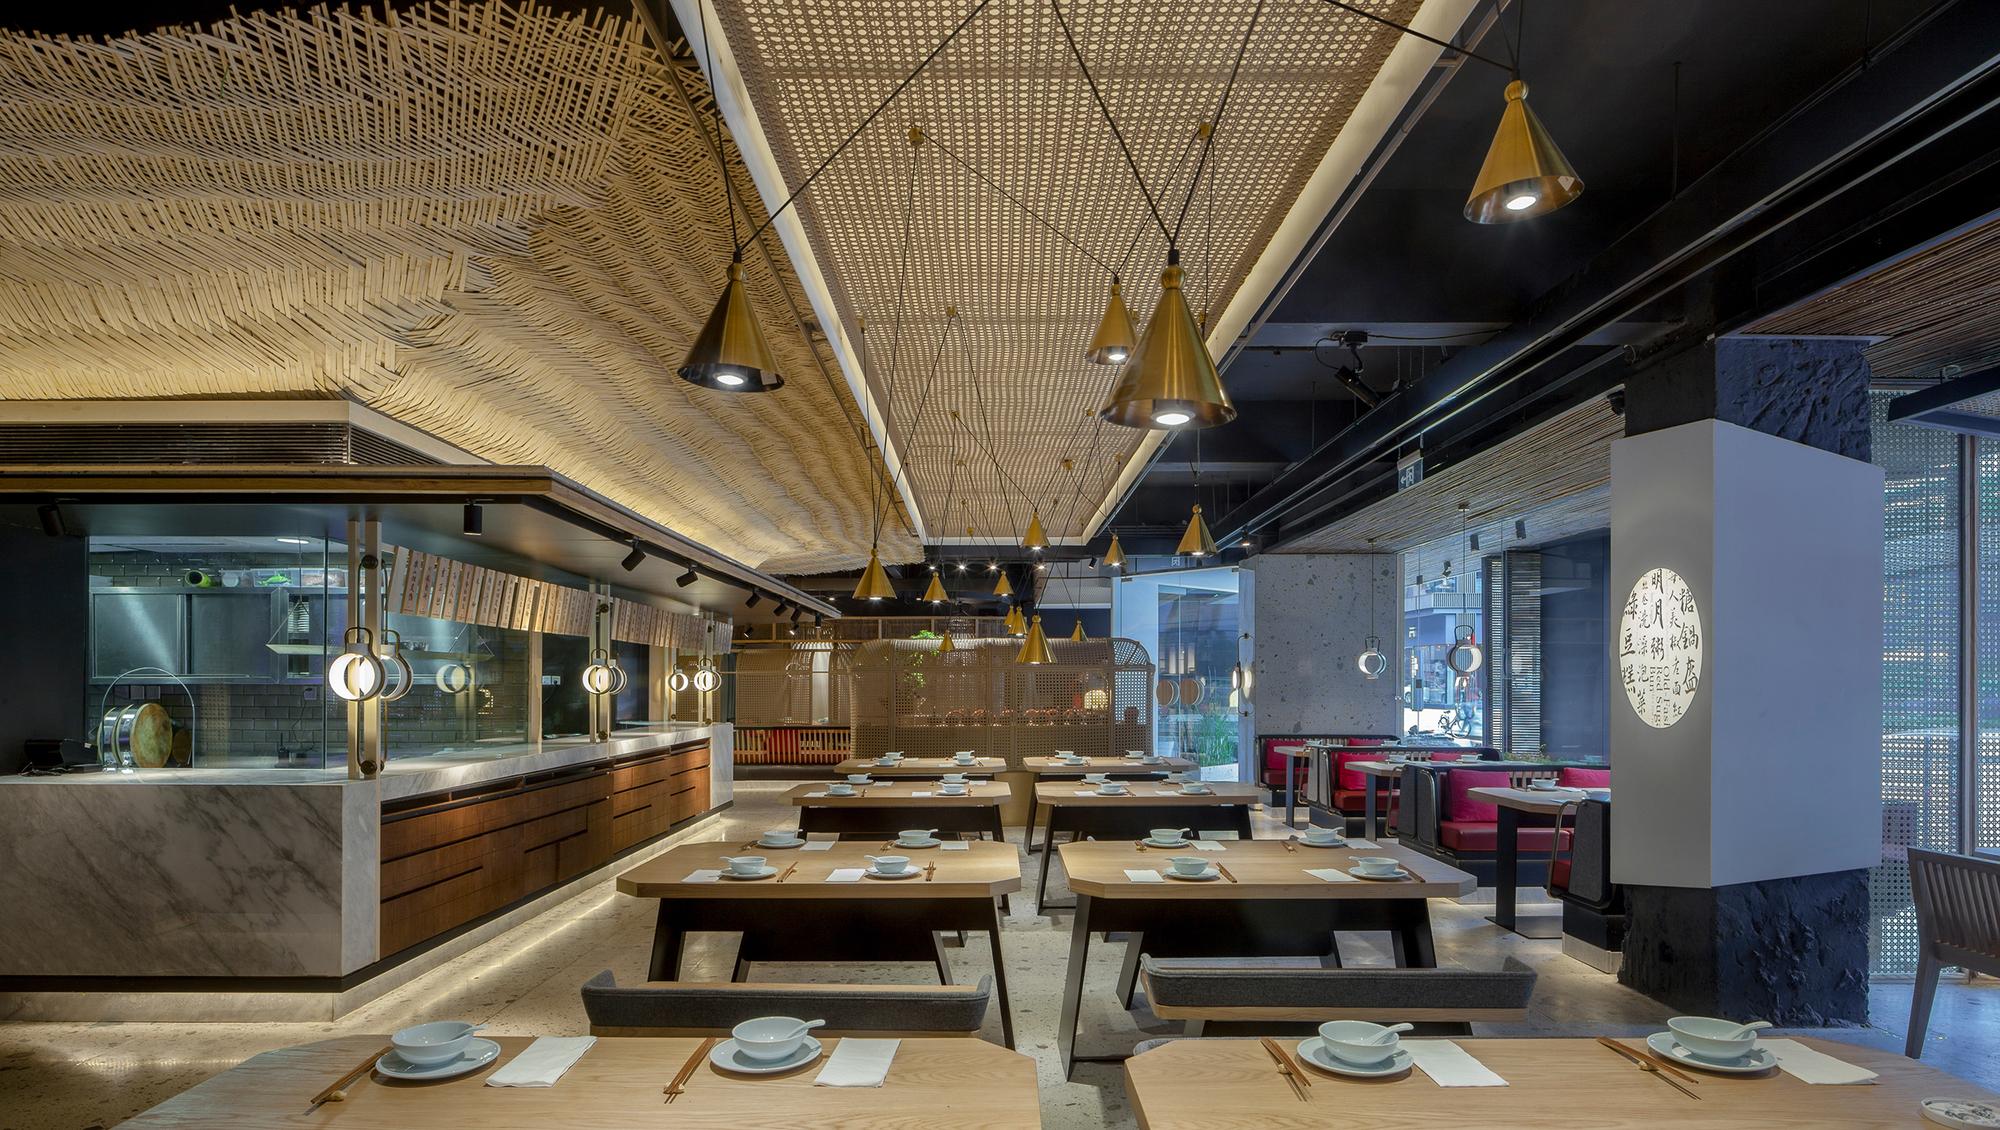 Gallery Of Ma 39 S Kitchen Chengdu Hummingbird Design Consultant Co Ltd 1